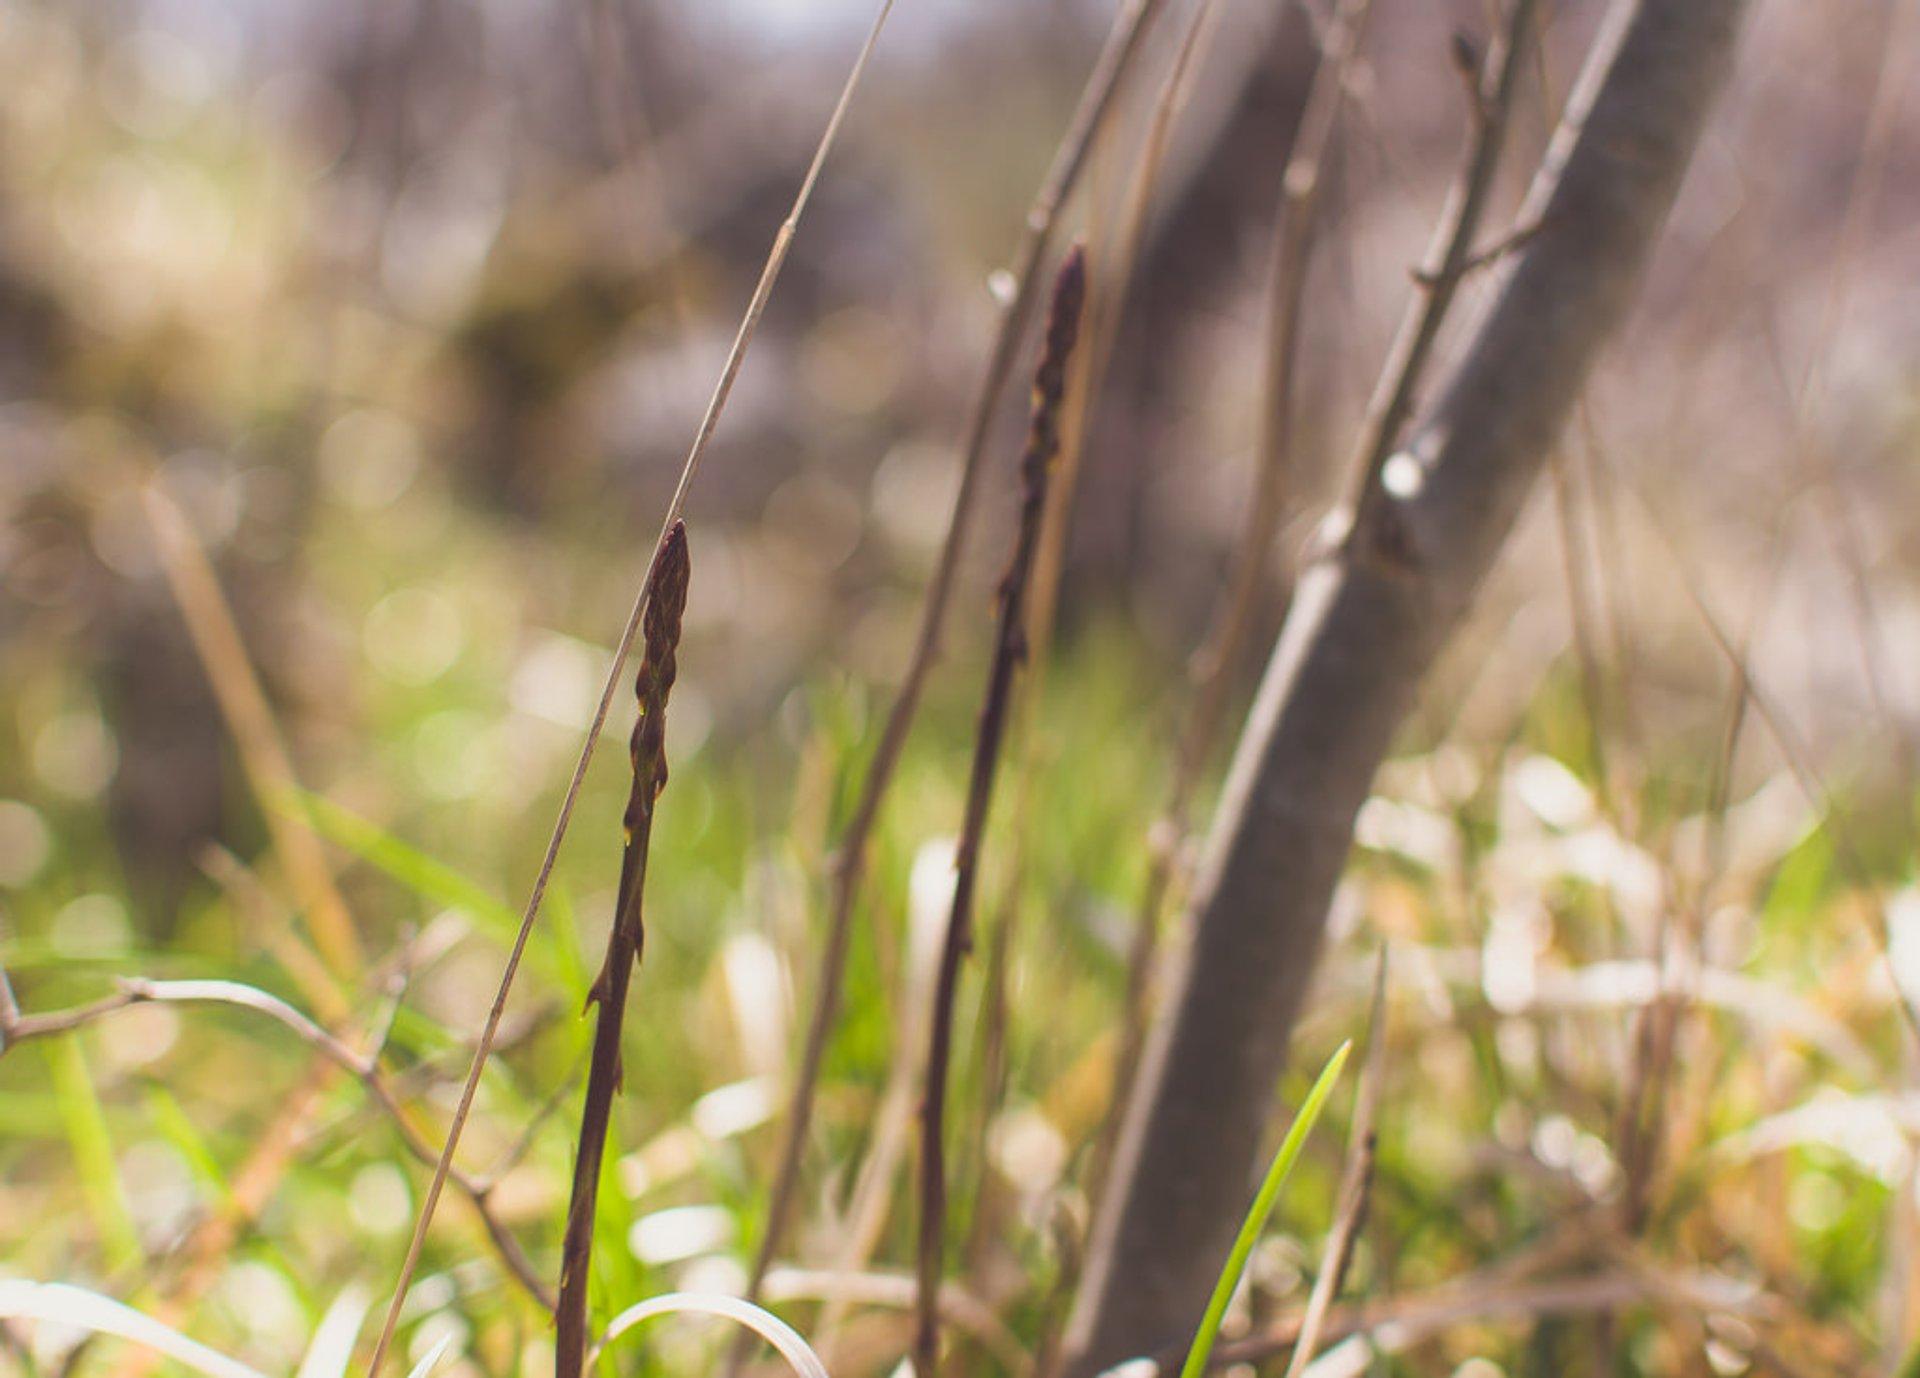 Asparagus Season in Croatia - Best Season 2020